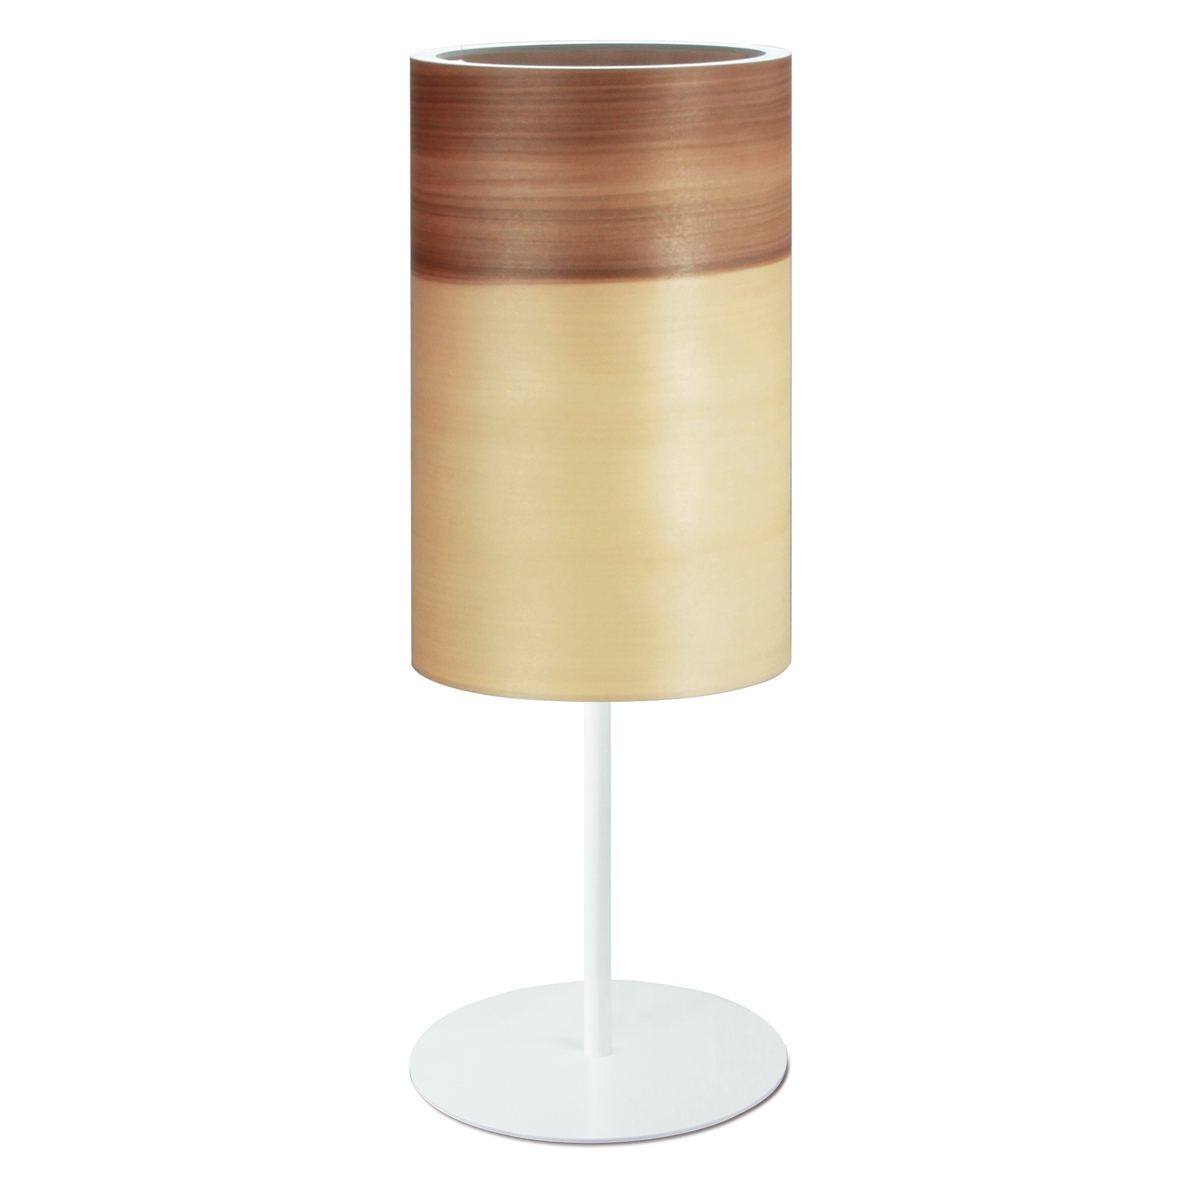 Lampe poser cylindrique au design minimaliste en bois for Lampe a poser bois